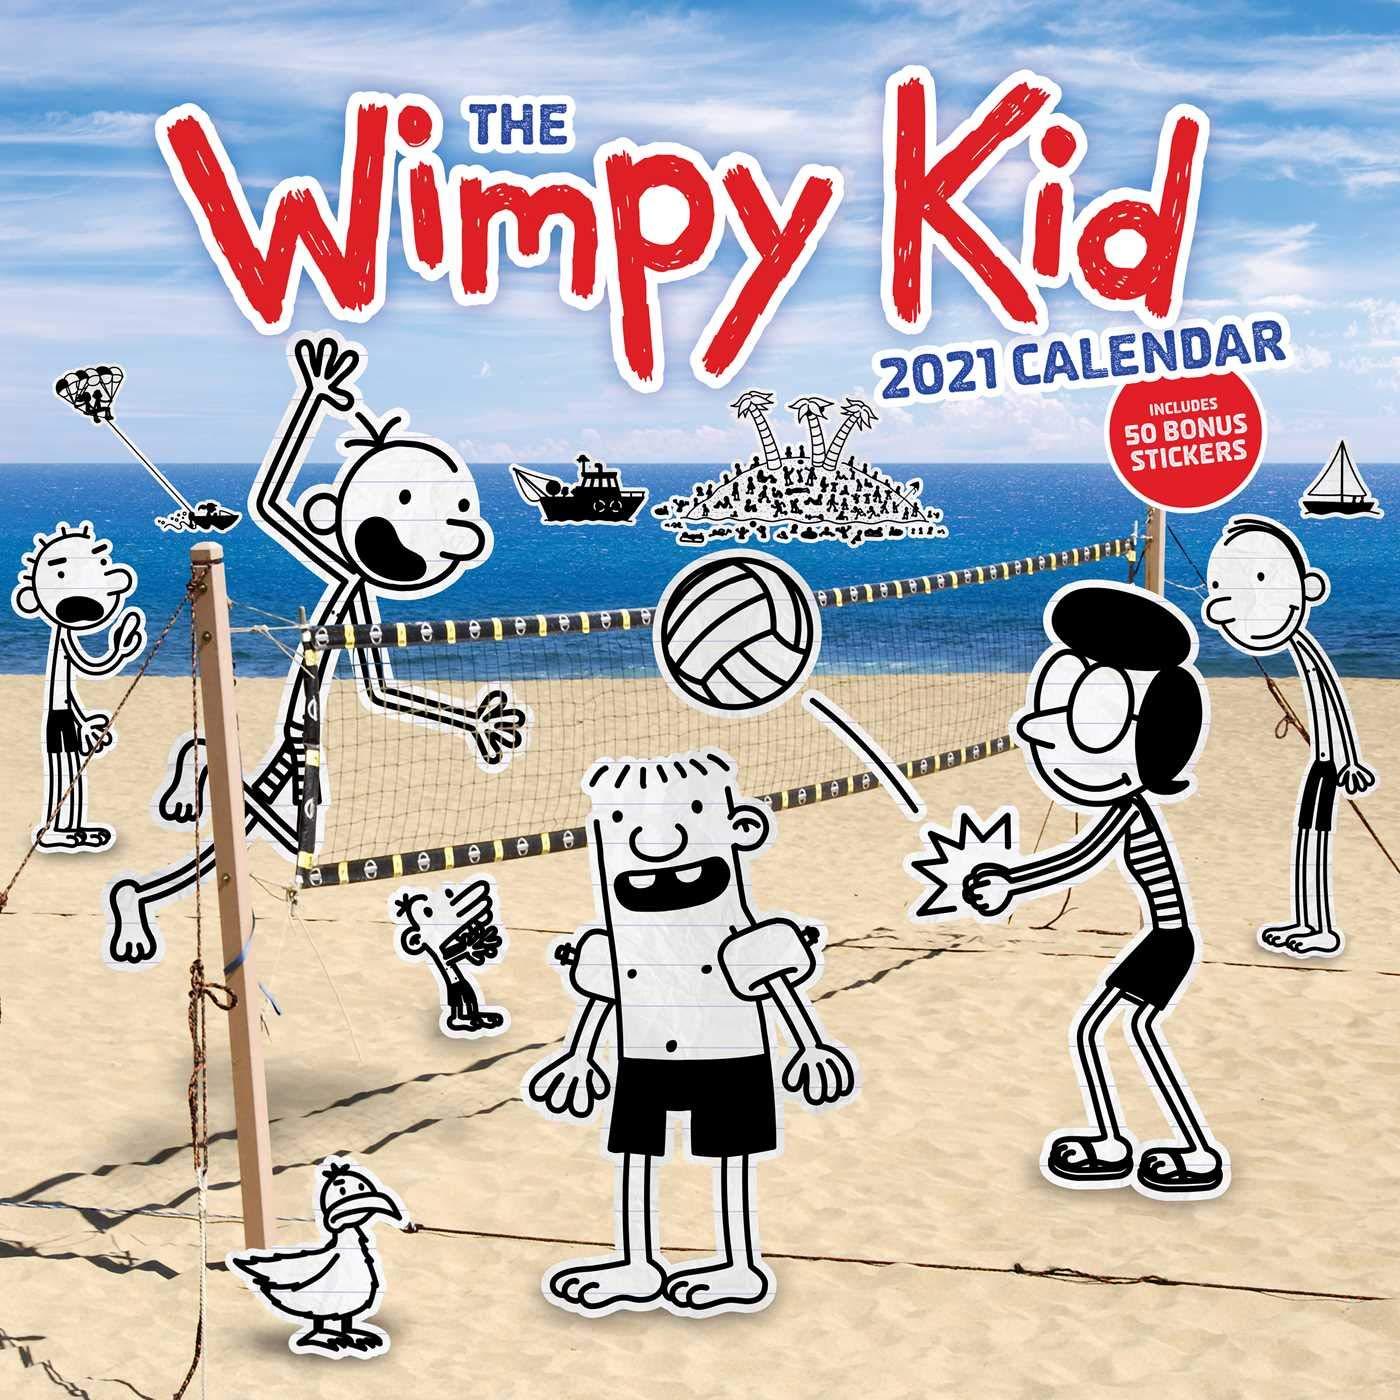 Wimpy Kid 2021 Wall Calendar